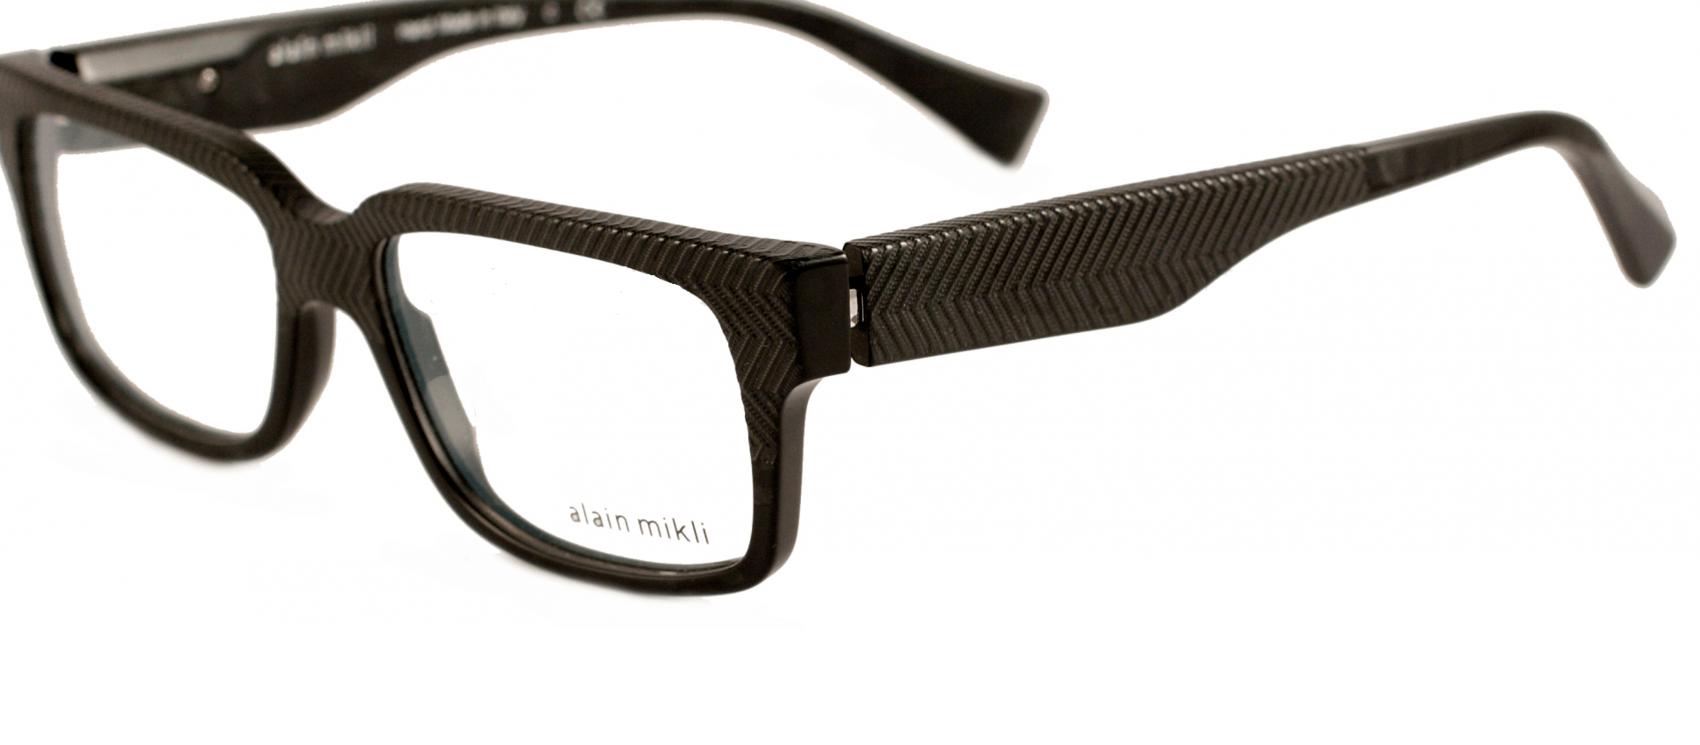 Alain Mikli Designer Eyewear A03026 Eyeglasses